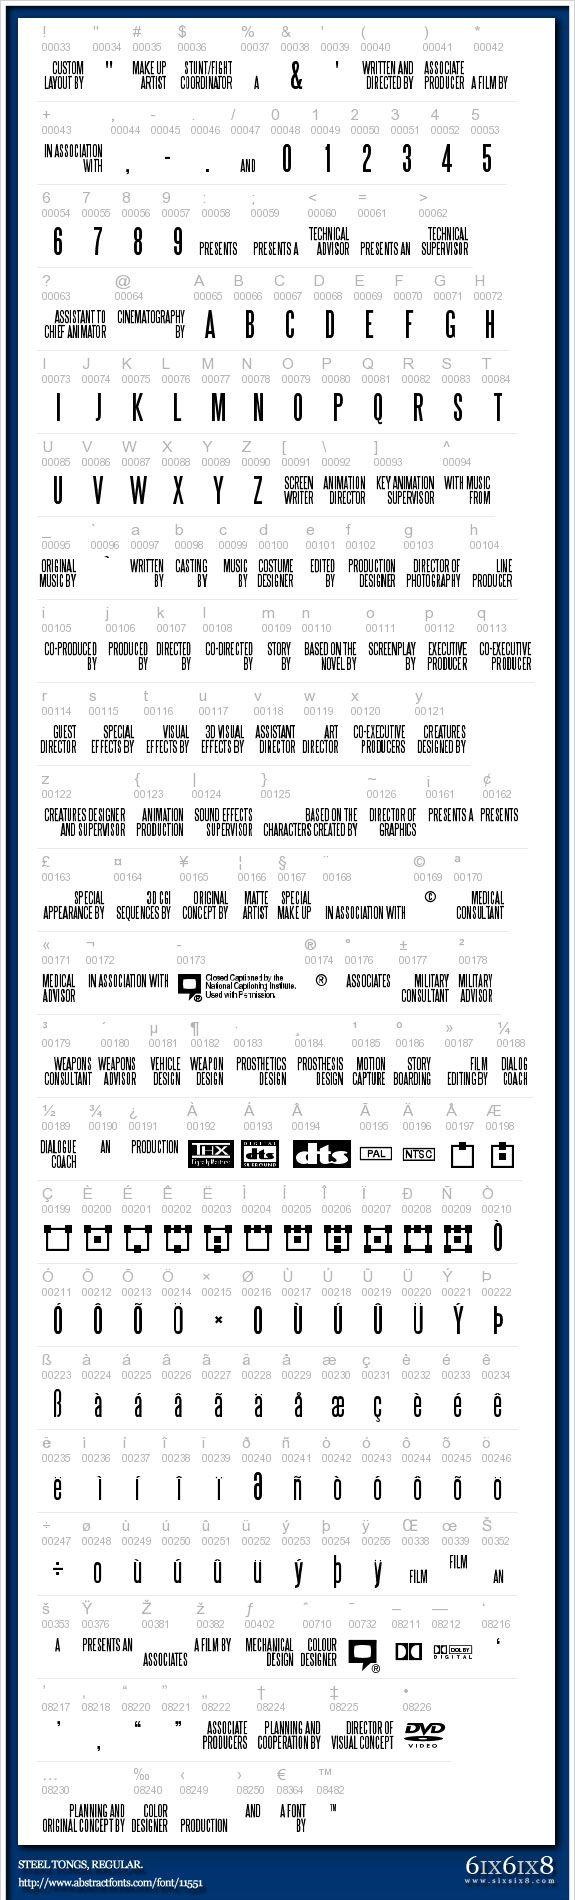 Joy movie poster text font